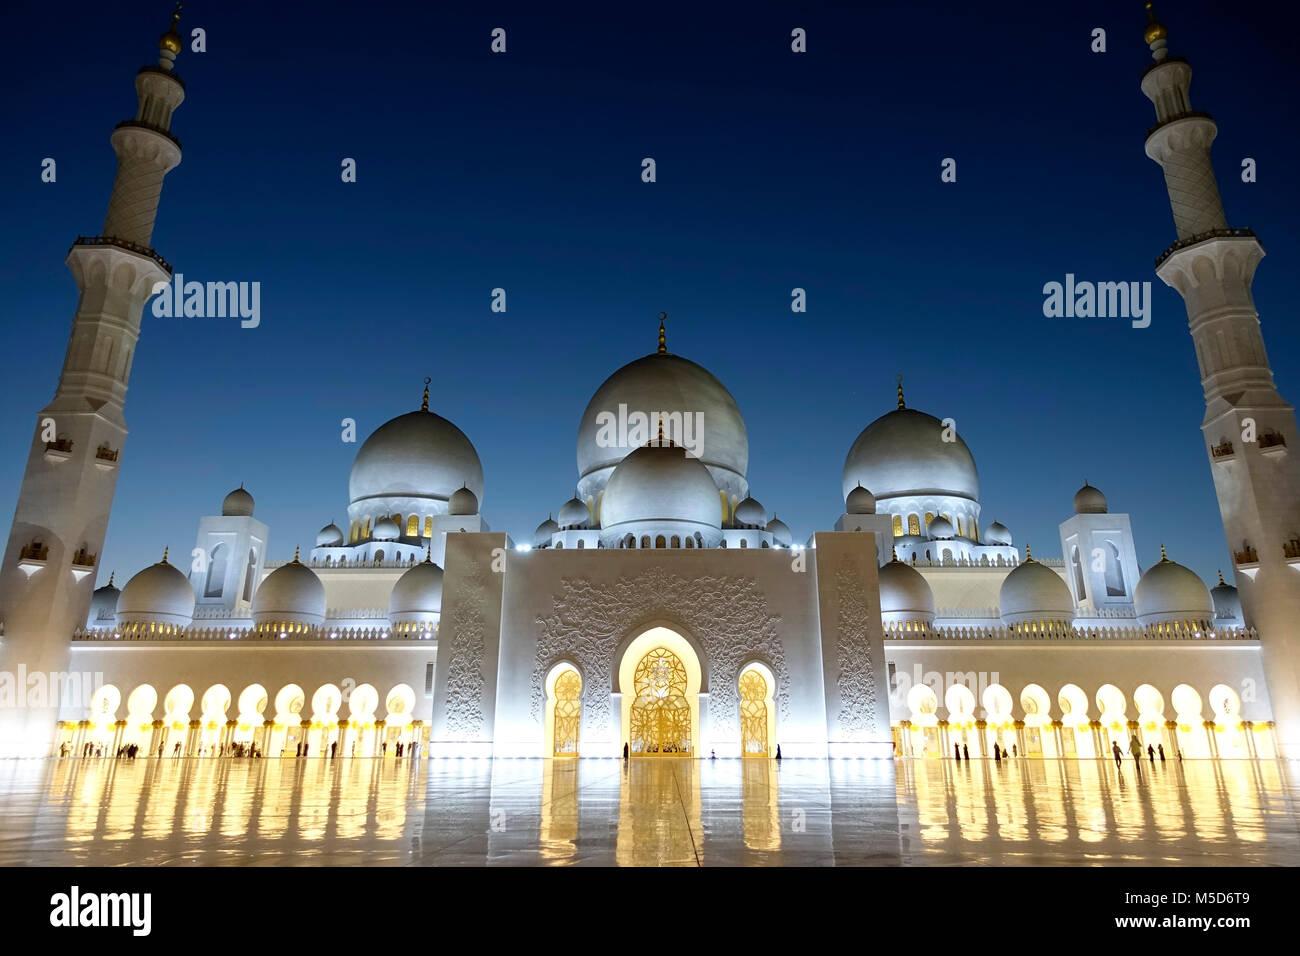 Lo Sceicco Zayid moschea di notte, Abu Dhabi, Emirati Arabi Uniti Immagini Stock